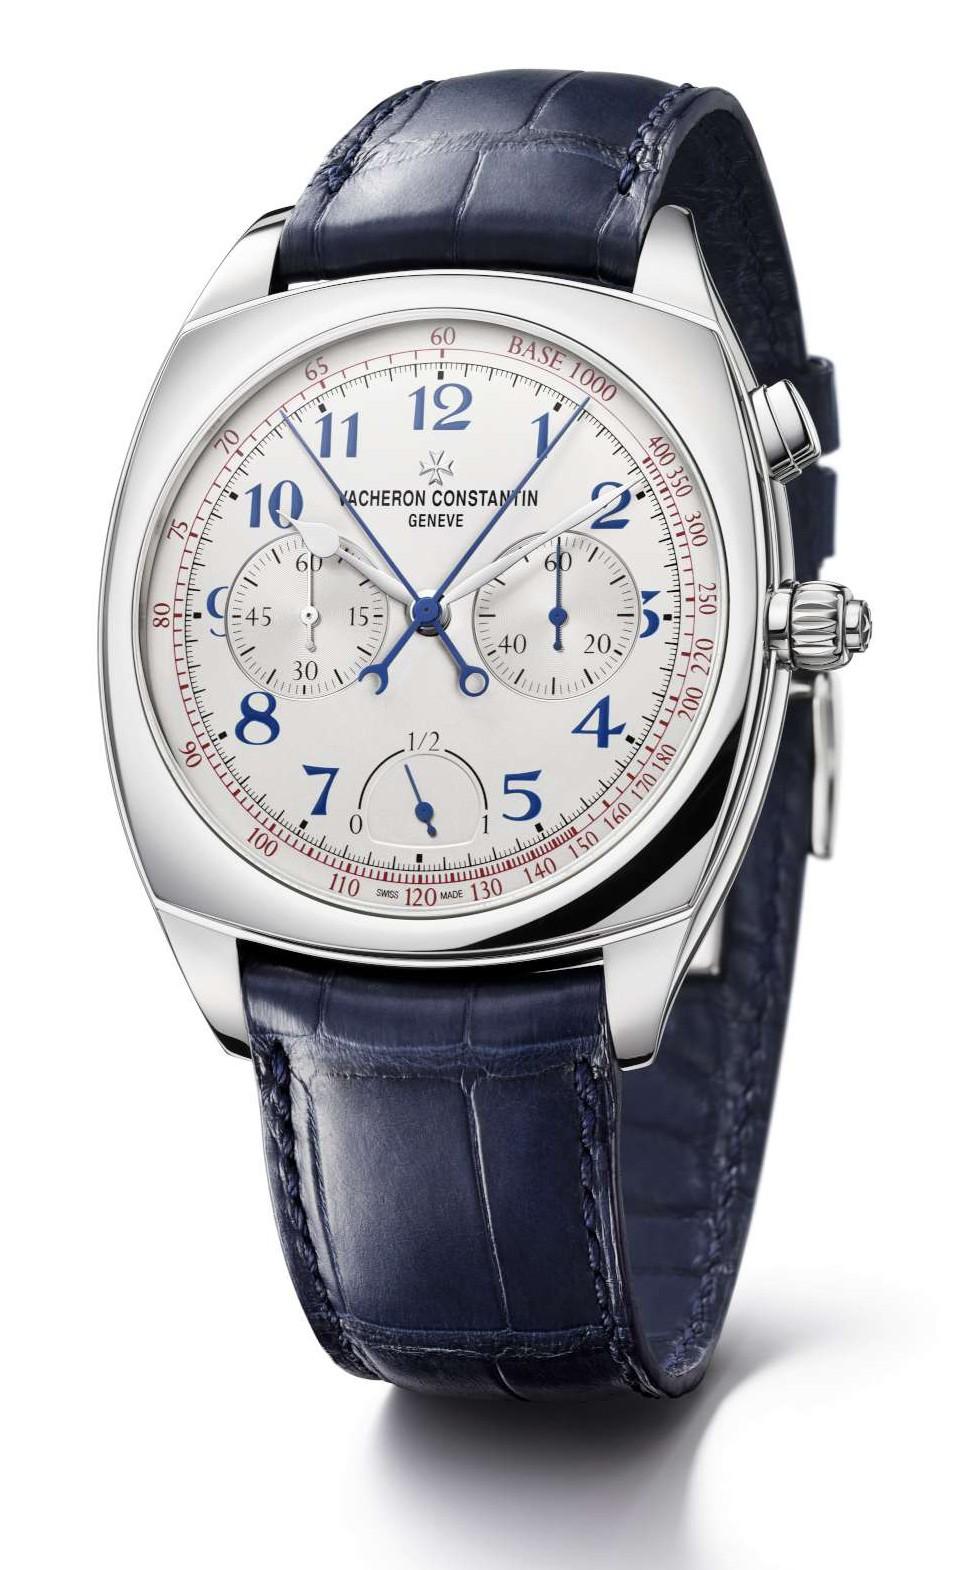 Vacheron Constantin Harmony Ultra-Thin Grand Complication Chronograph